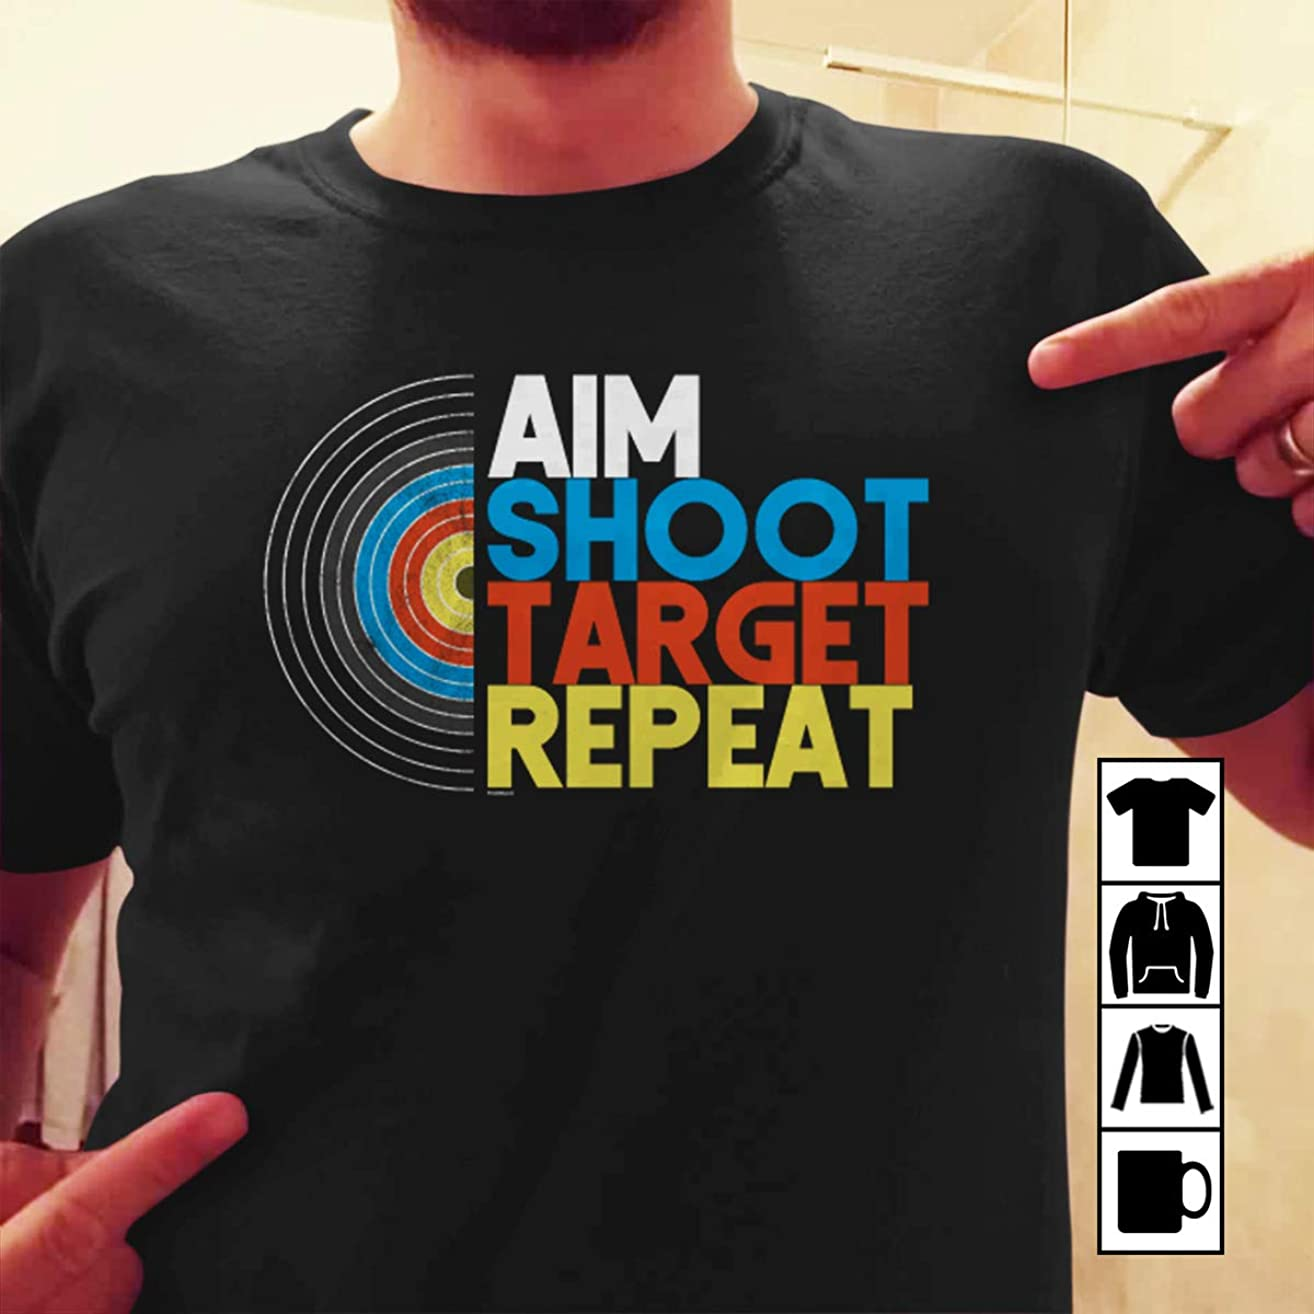 Archer Archery Aim Shoot Target Repeat T Shirt Long Sleeve Sweatshirt Hoodie Youth